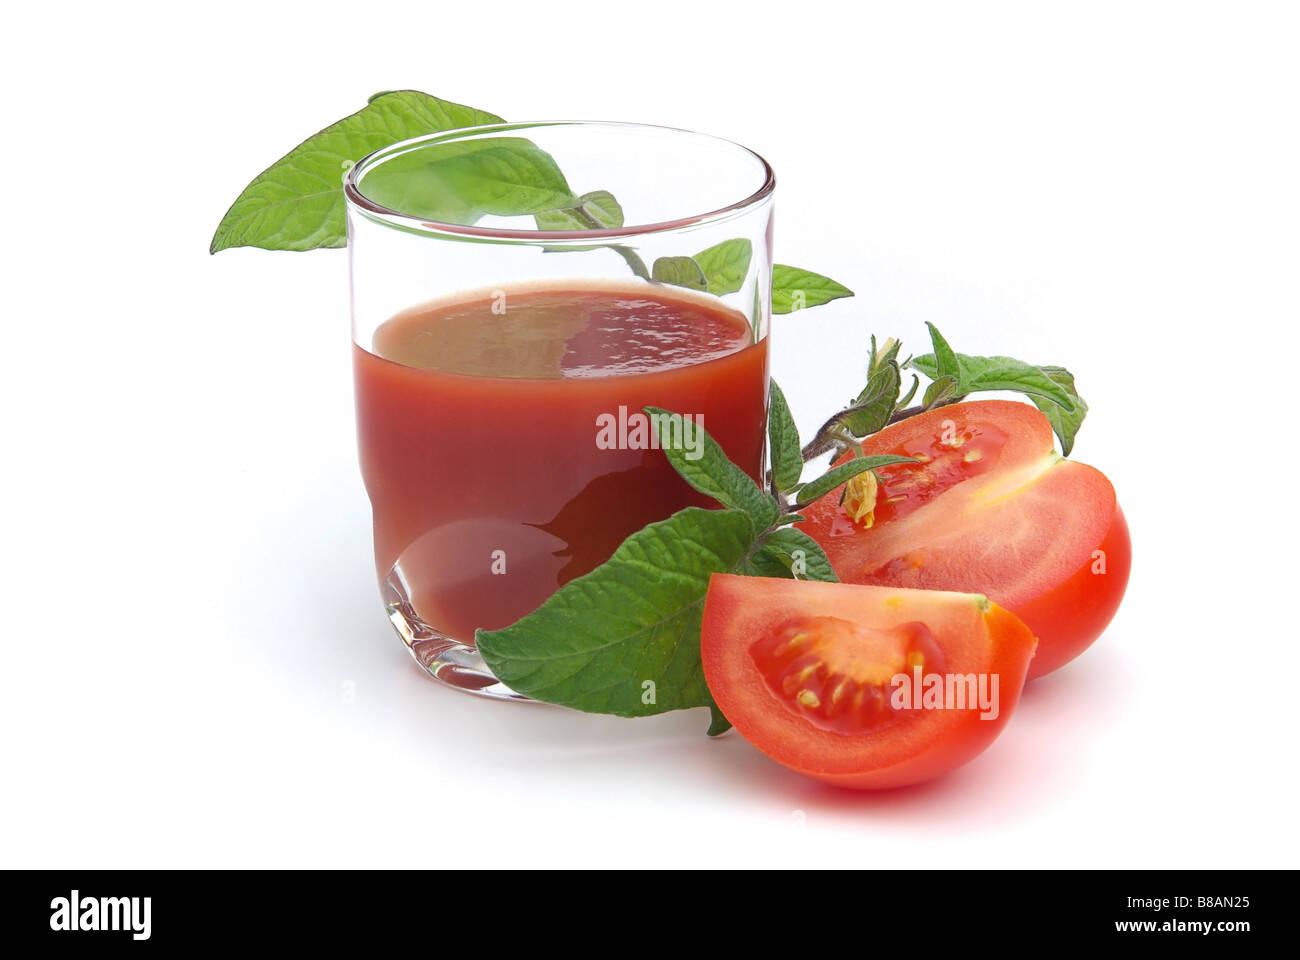 Tomatensaft tomato juice 08 - Stock Image